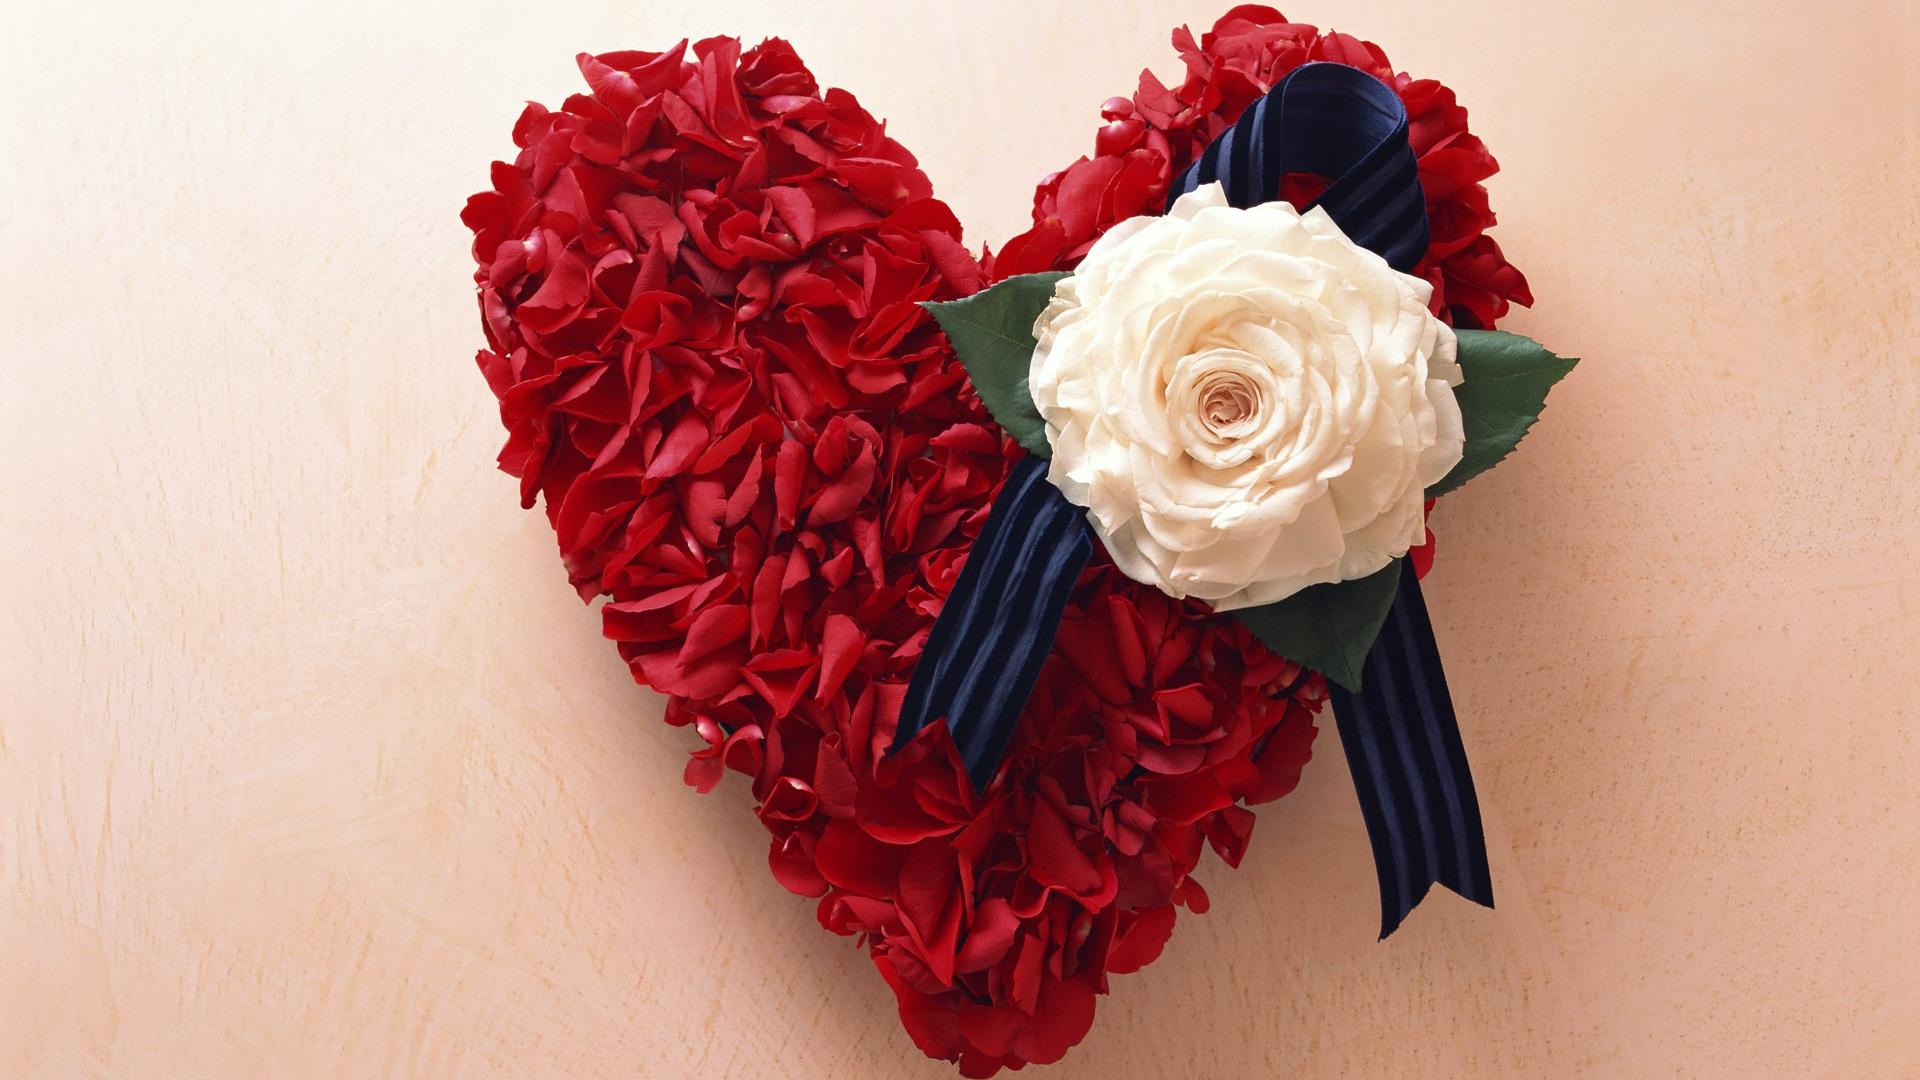 Download Love Hearts HD Wallpapers Live HD Wallpaper HQ 1920x1080